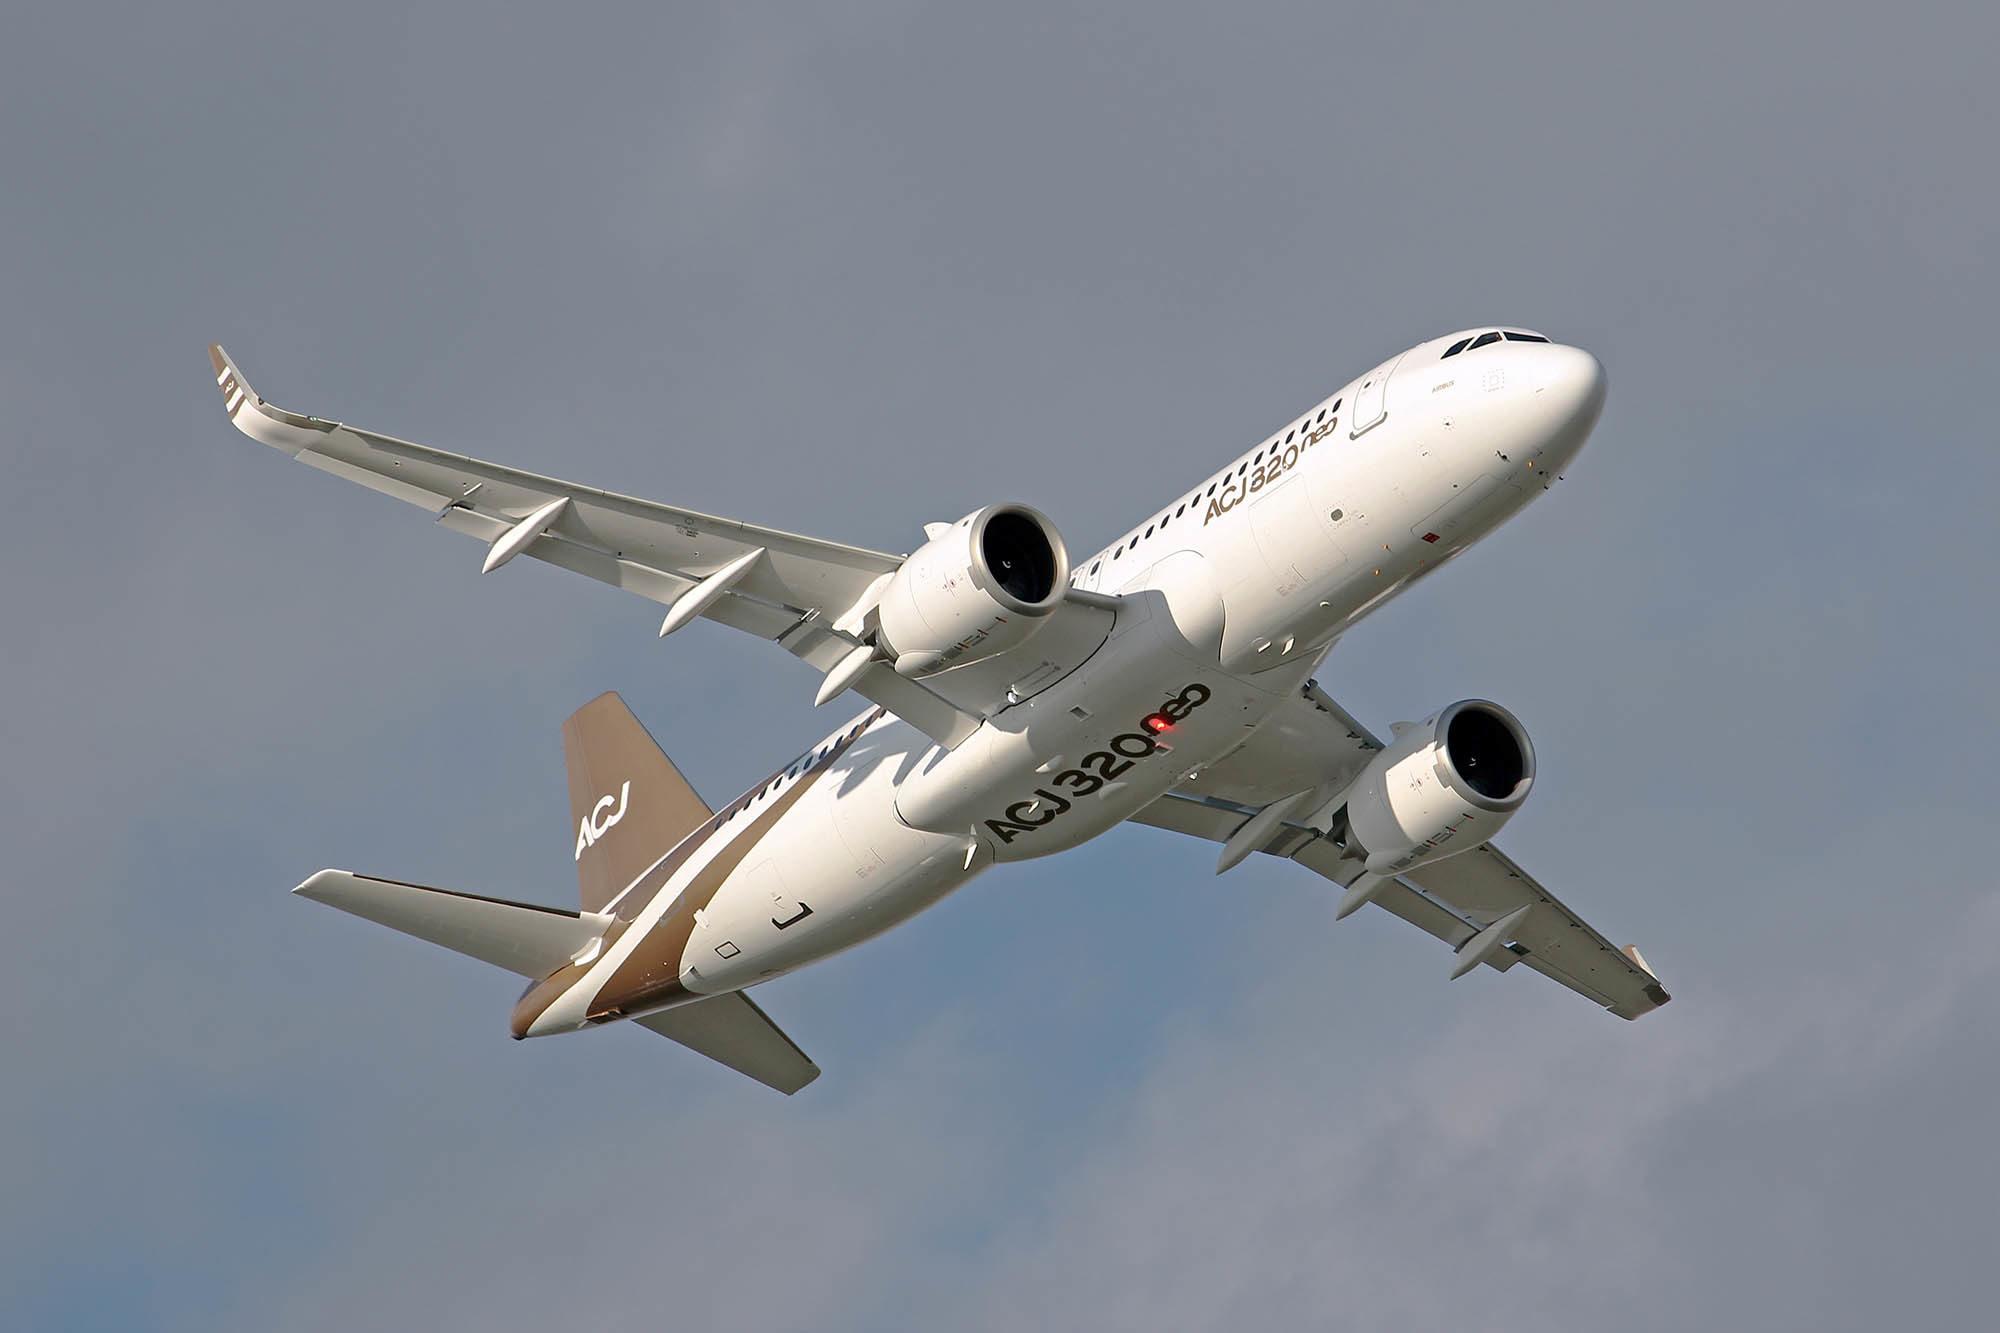 acj private jets a320 - A320 Airbus Corporate